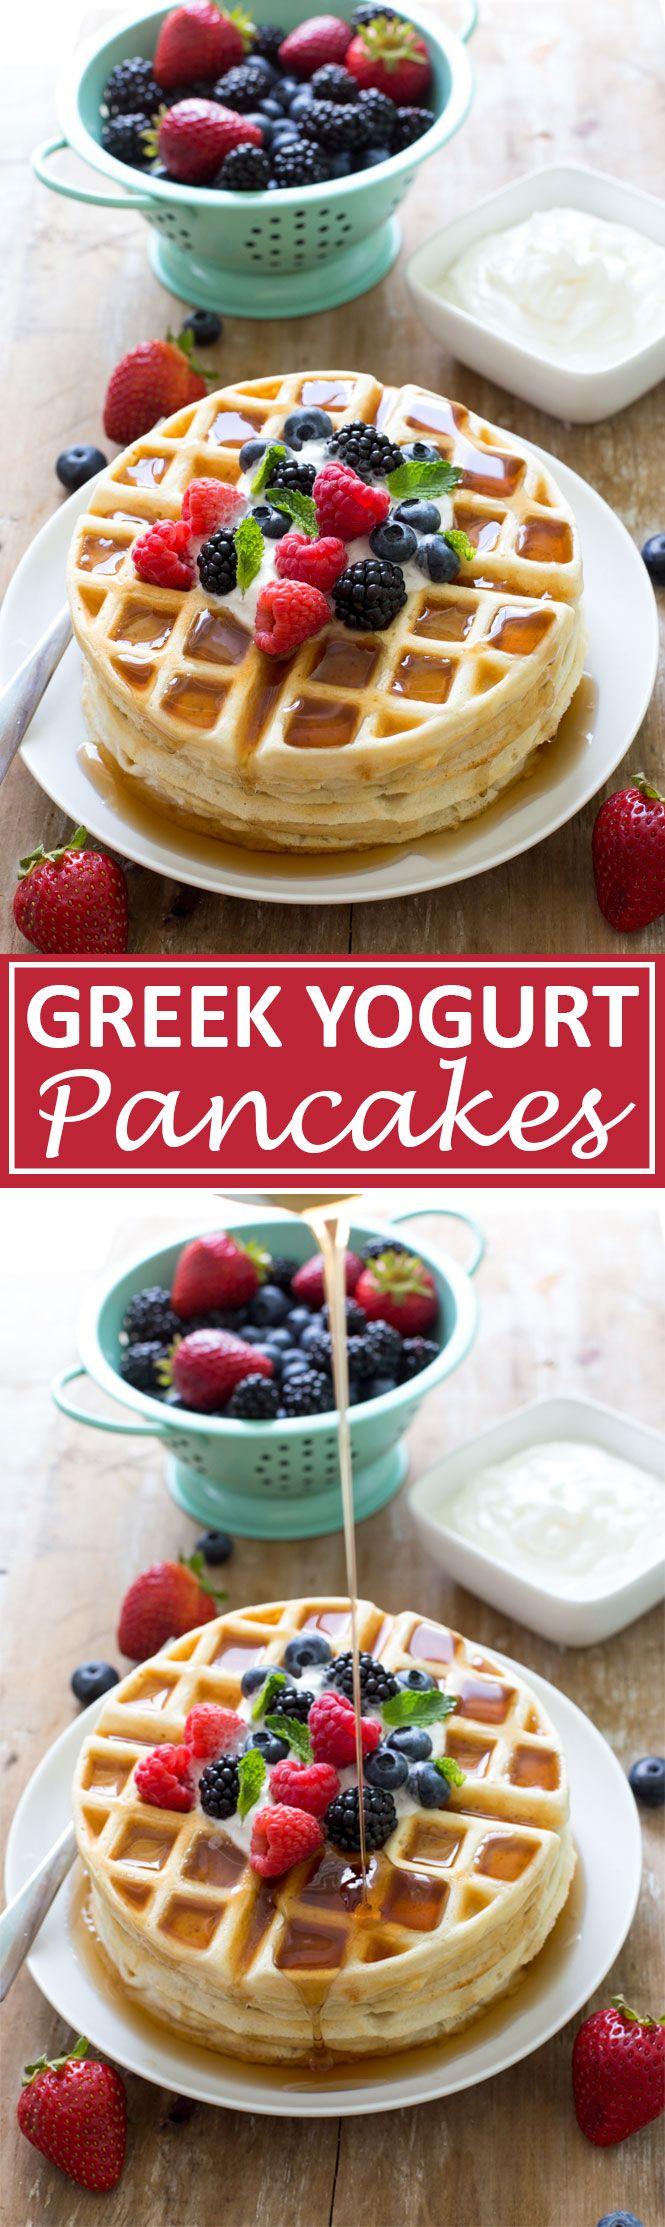 http://www.2uidea.com/category/Yogurt-Maker/ Soft and Fluffy Greek Yogurt…